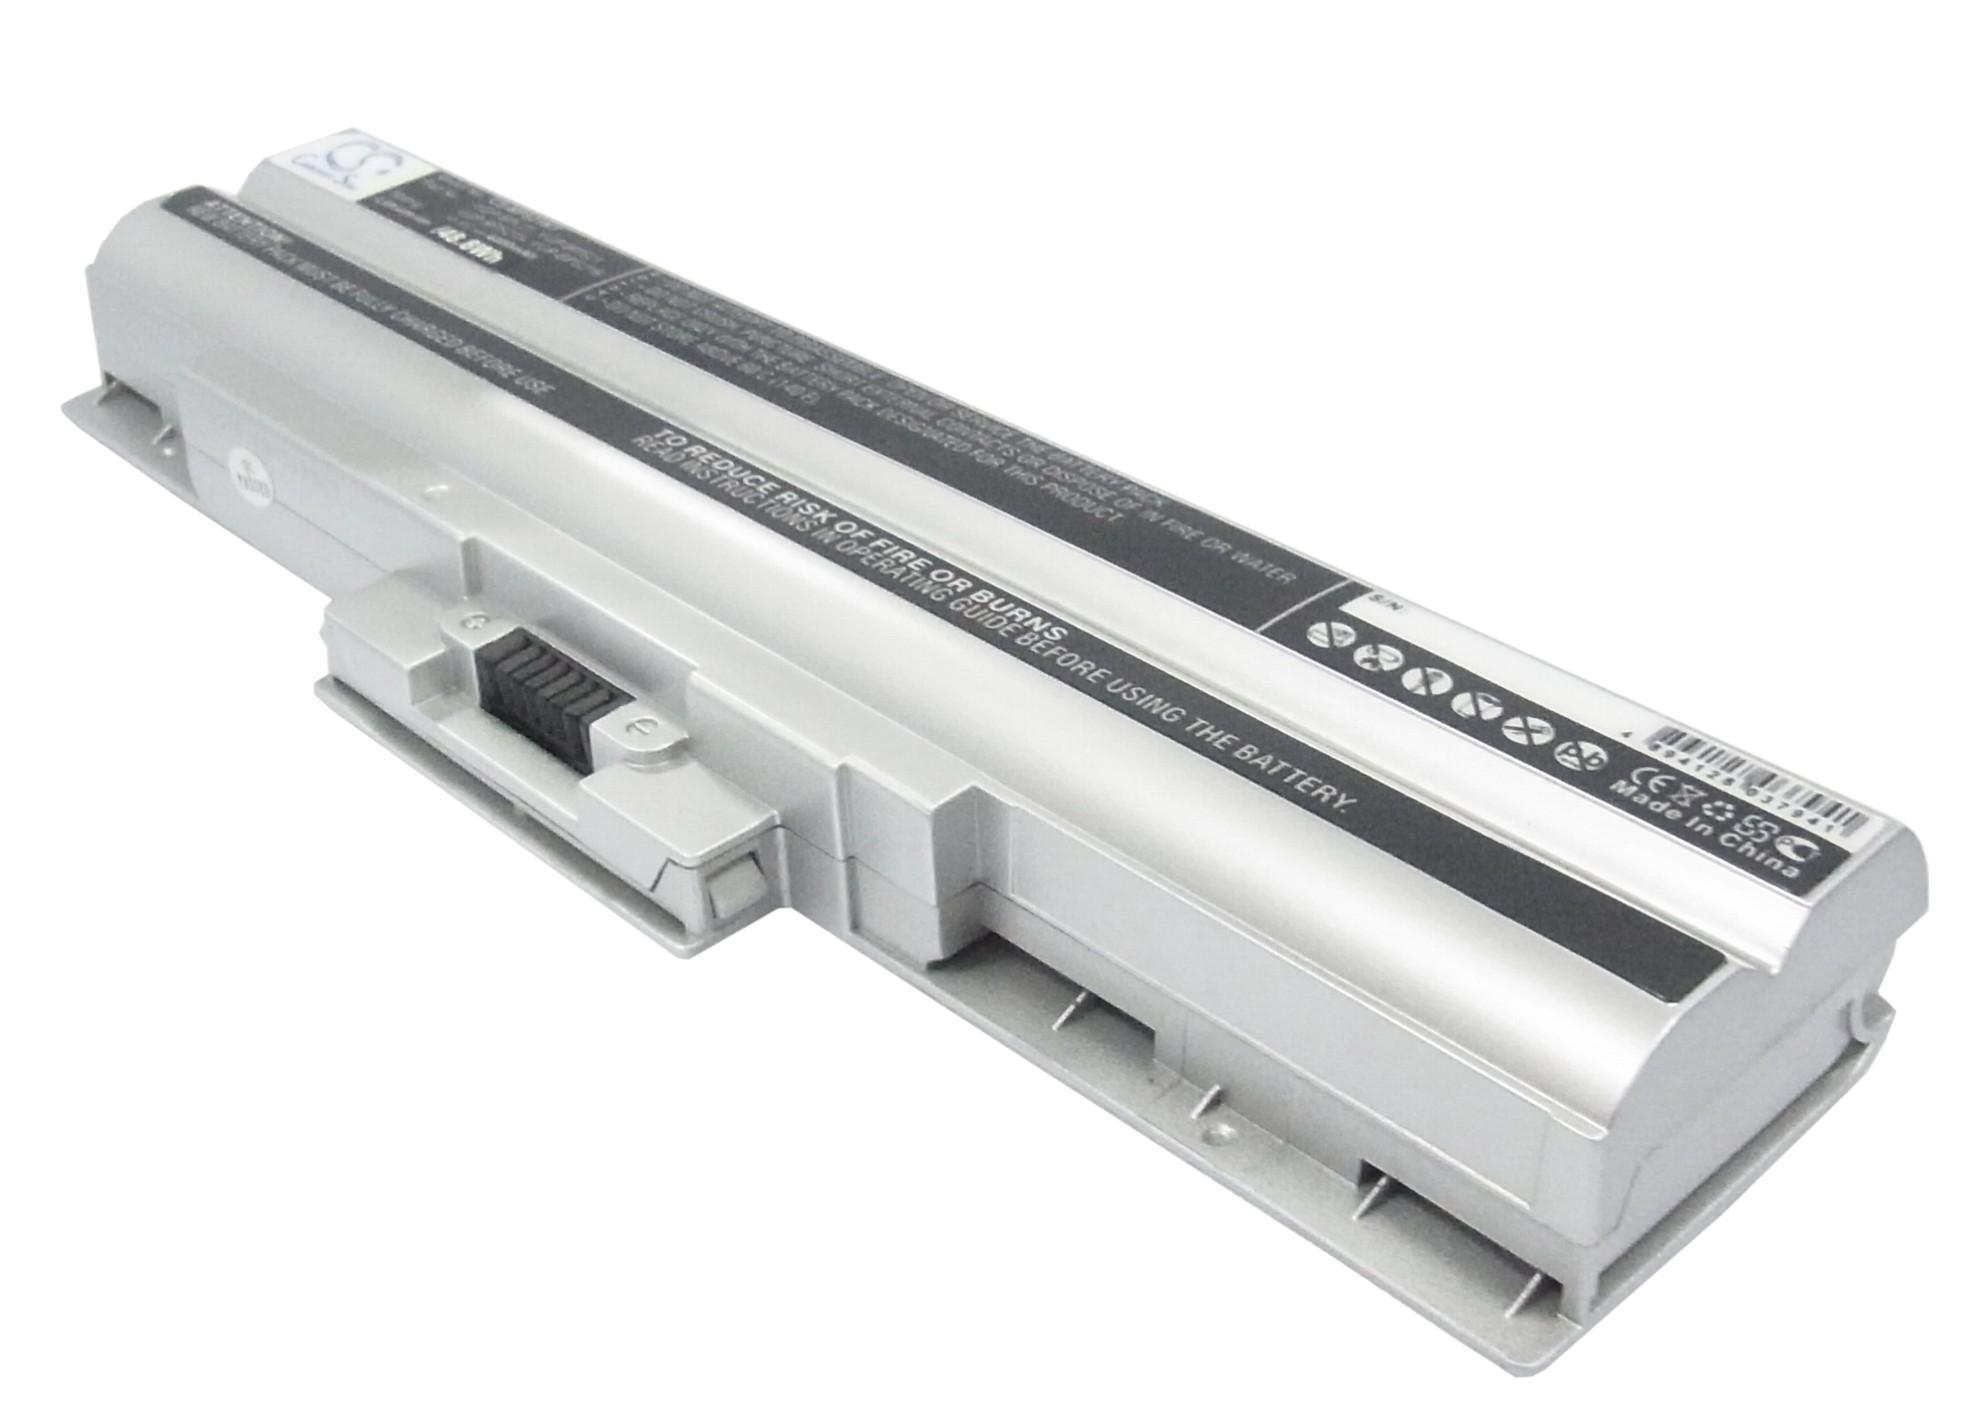 Cameron Sino baterie do notebooků pro SONY VAIO VGN-CS36GJ/P 11.1V Li-ion 4400mAh stříbrná - neoriginální